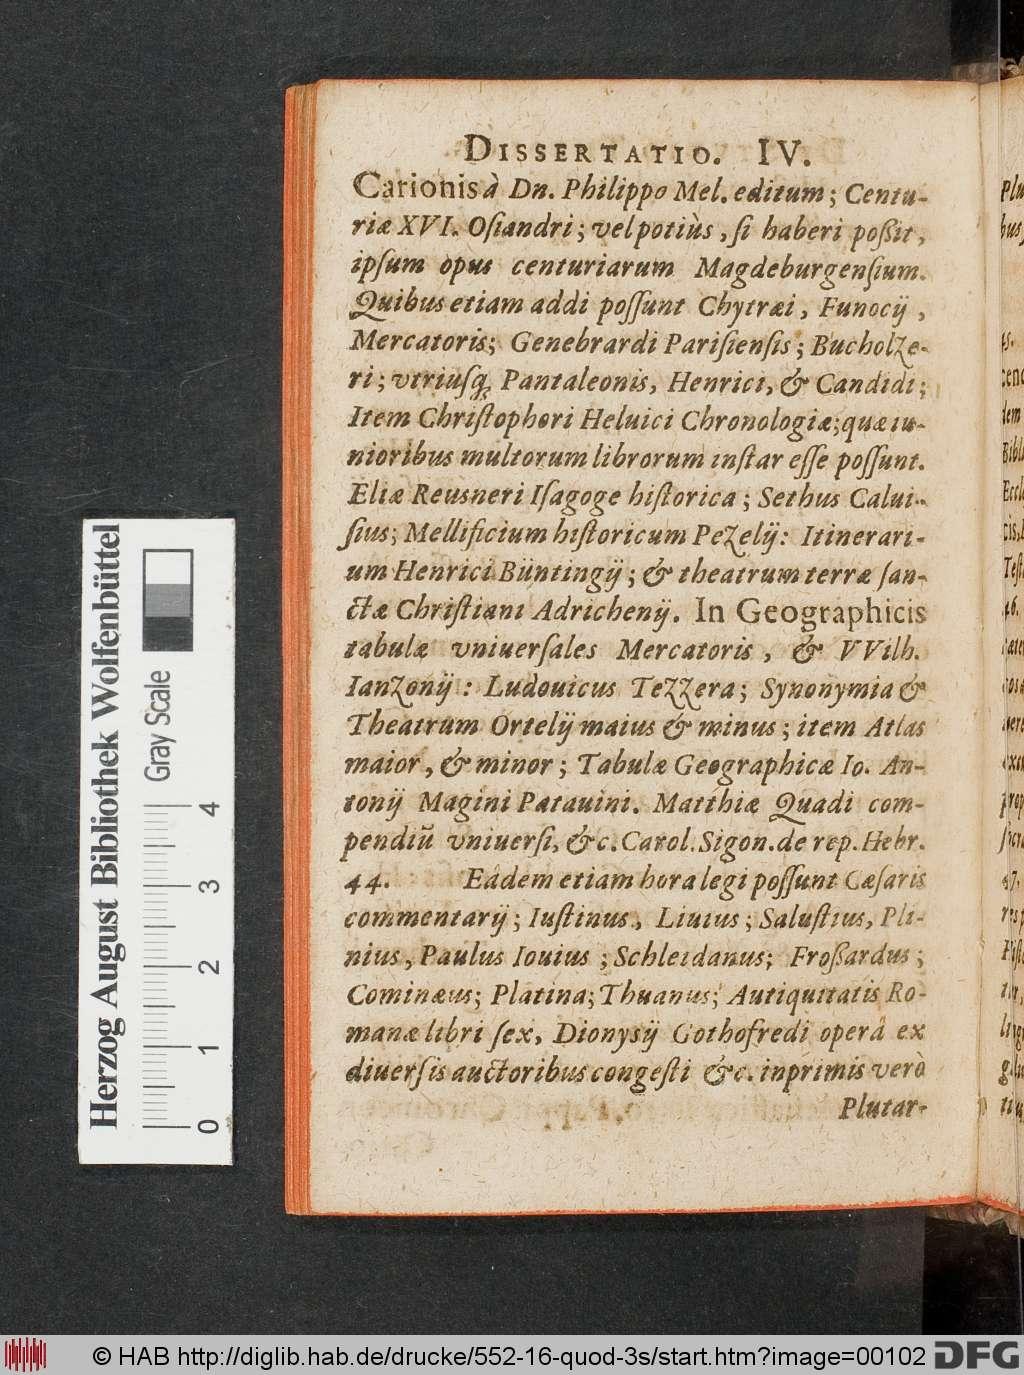 http://diglib.hab.de/drucke/552-16-quod-3s/00102.jpg